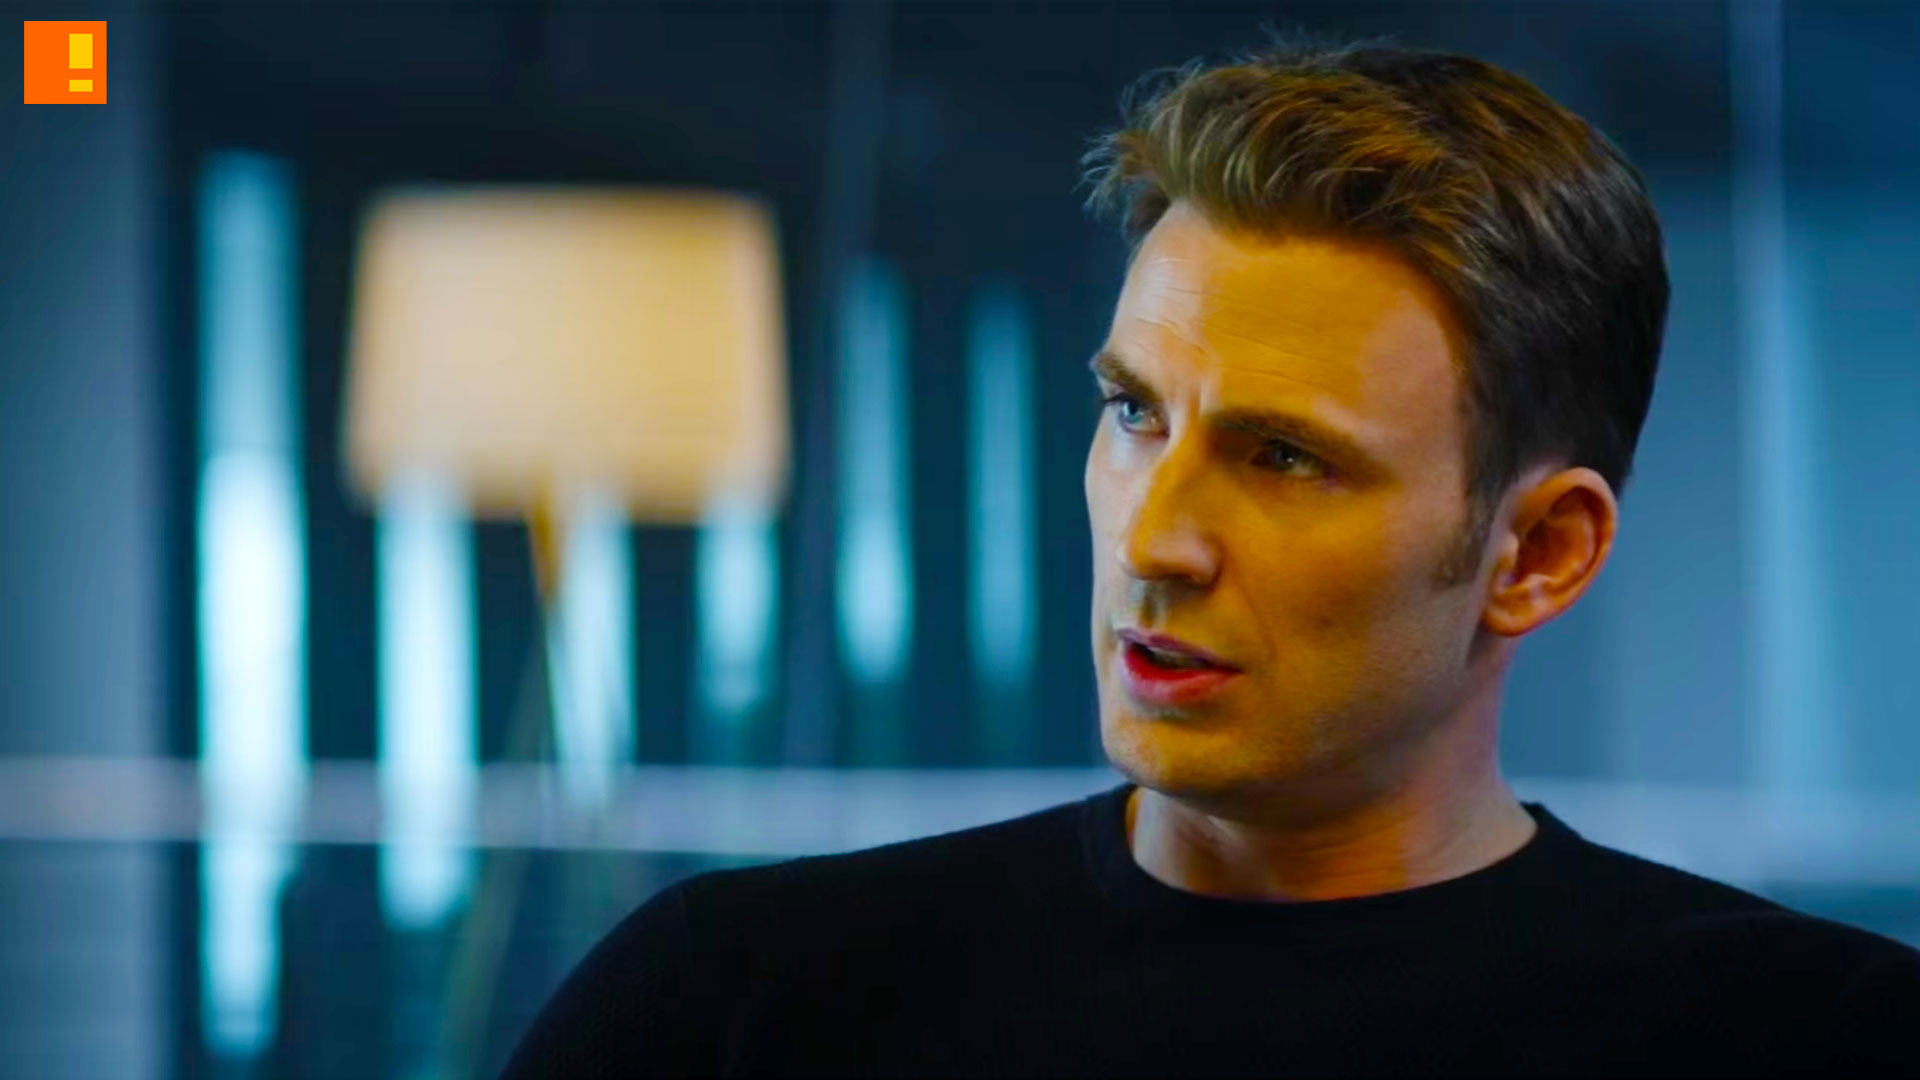 Chris Evans Explains Decision to Appear in Avengers 4 1920x1080